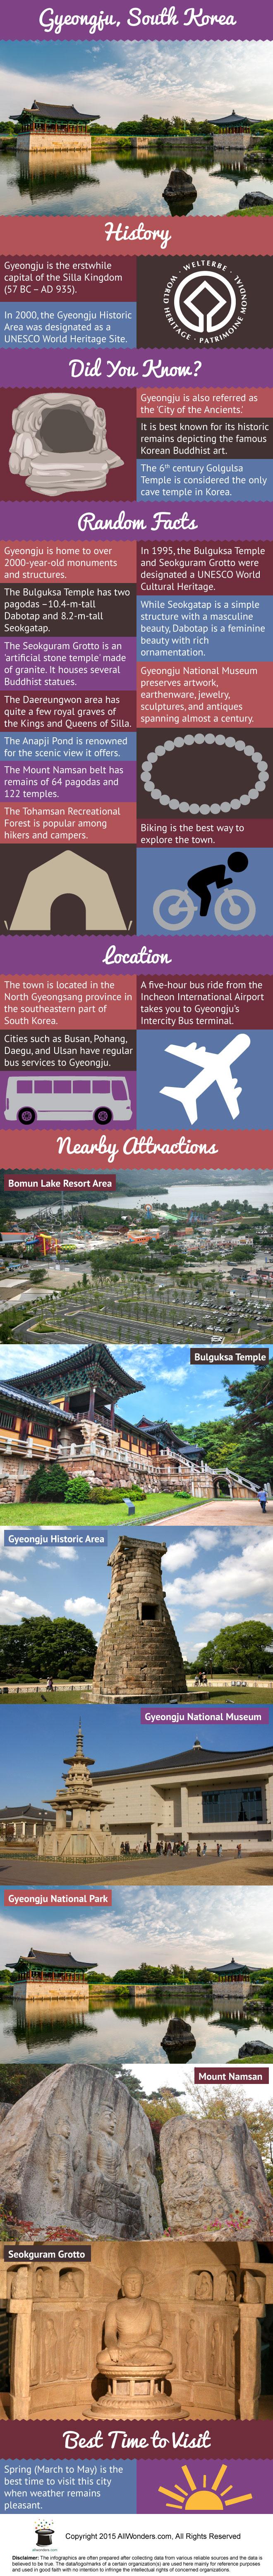 Gyeongju Infographic